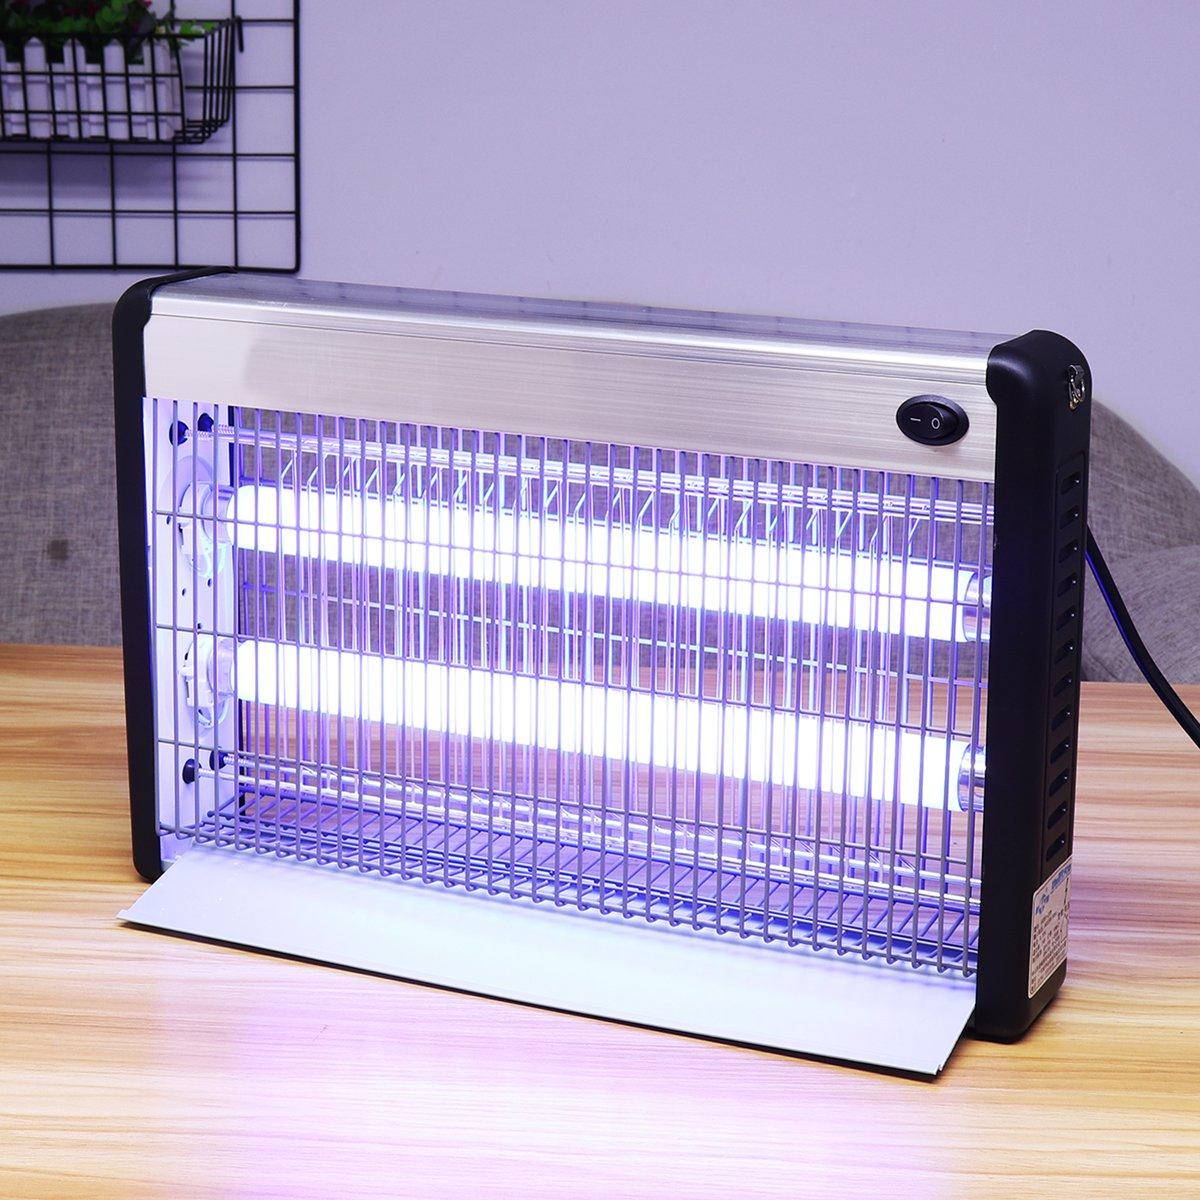 LED luz eléctrica asesino de insectos UV-A Mosquito Pest Fly Bug Zapper Catcher trampa de Control de plagas herramientas accesorios 20/ 30/40 W